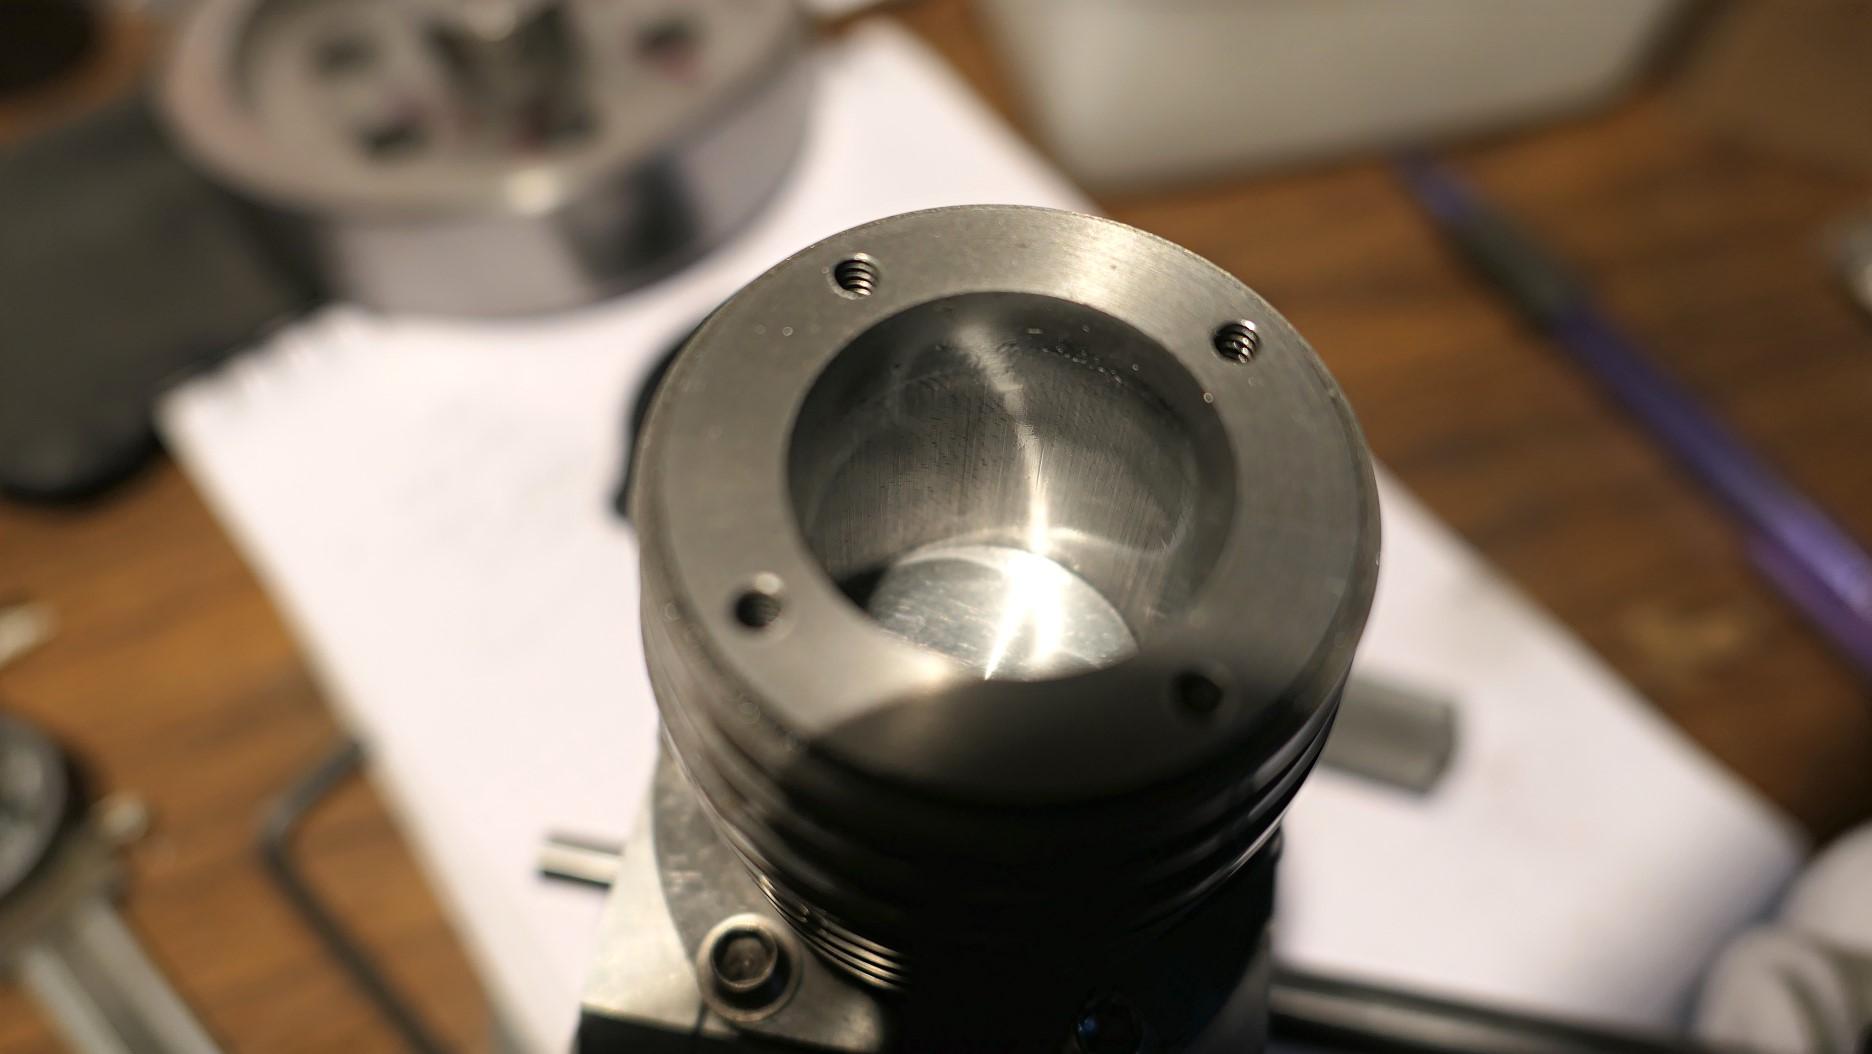 P1020028.JPG